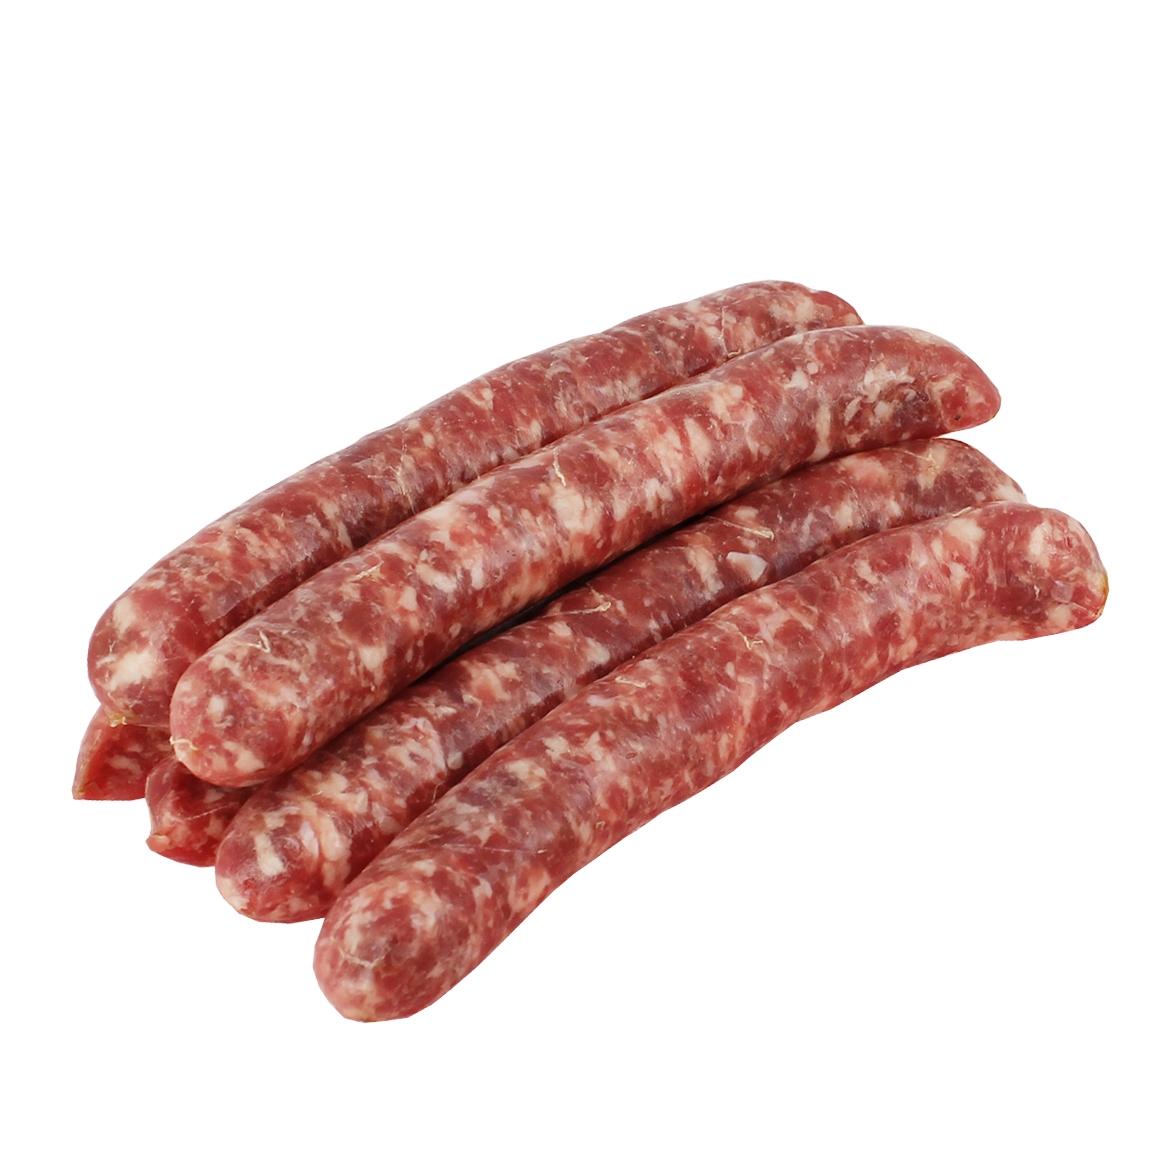 04/ Chipolatas 1kg - Lahouratate (FROSNE)